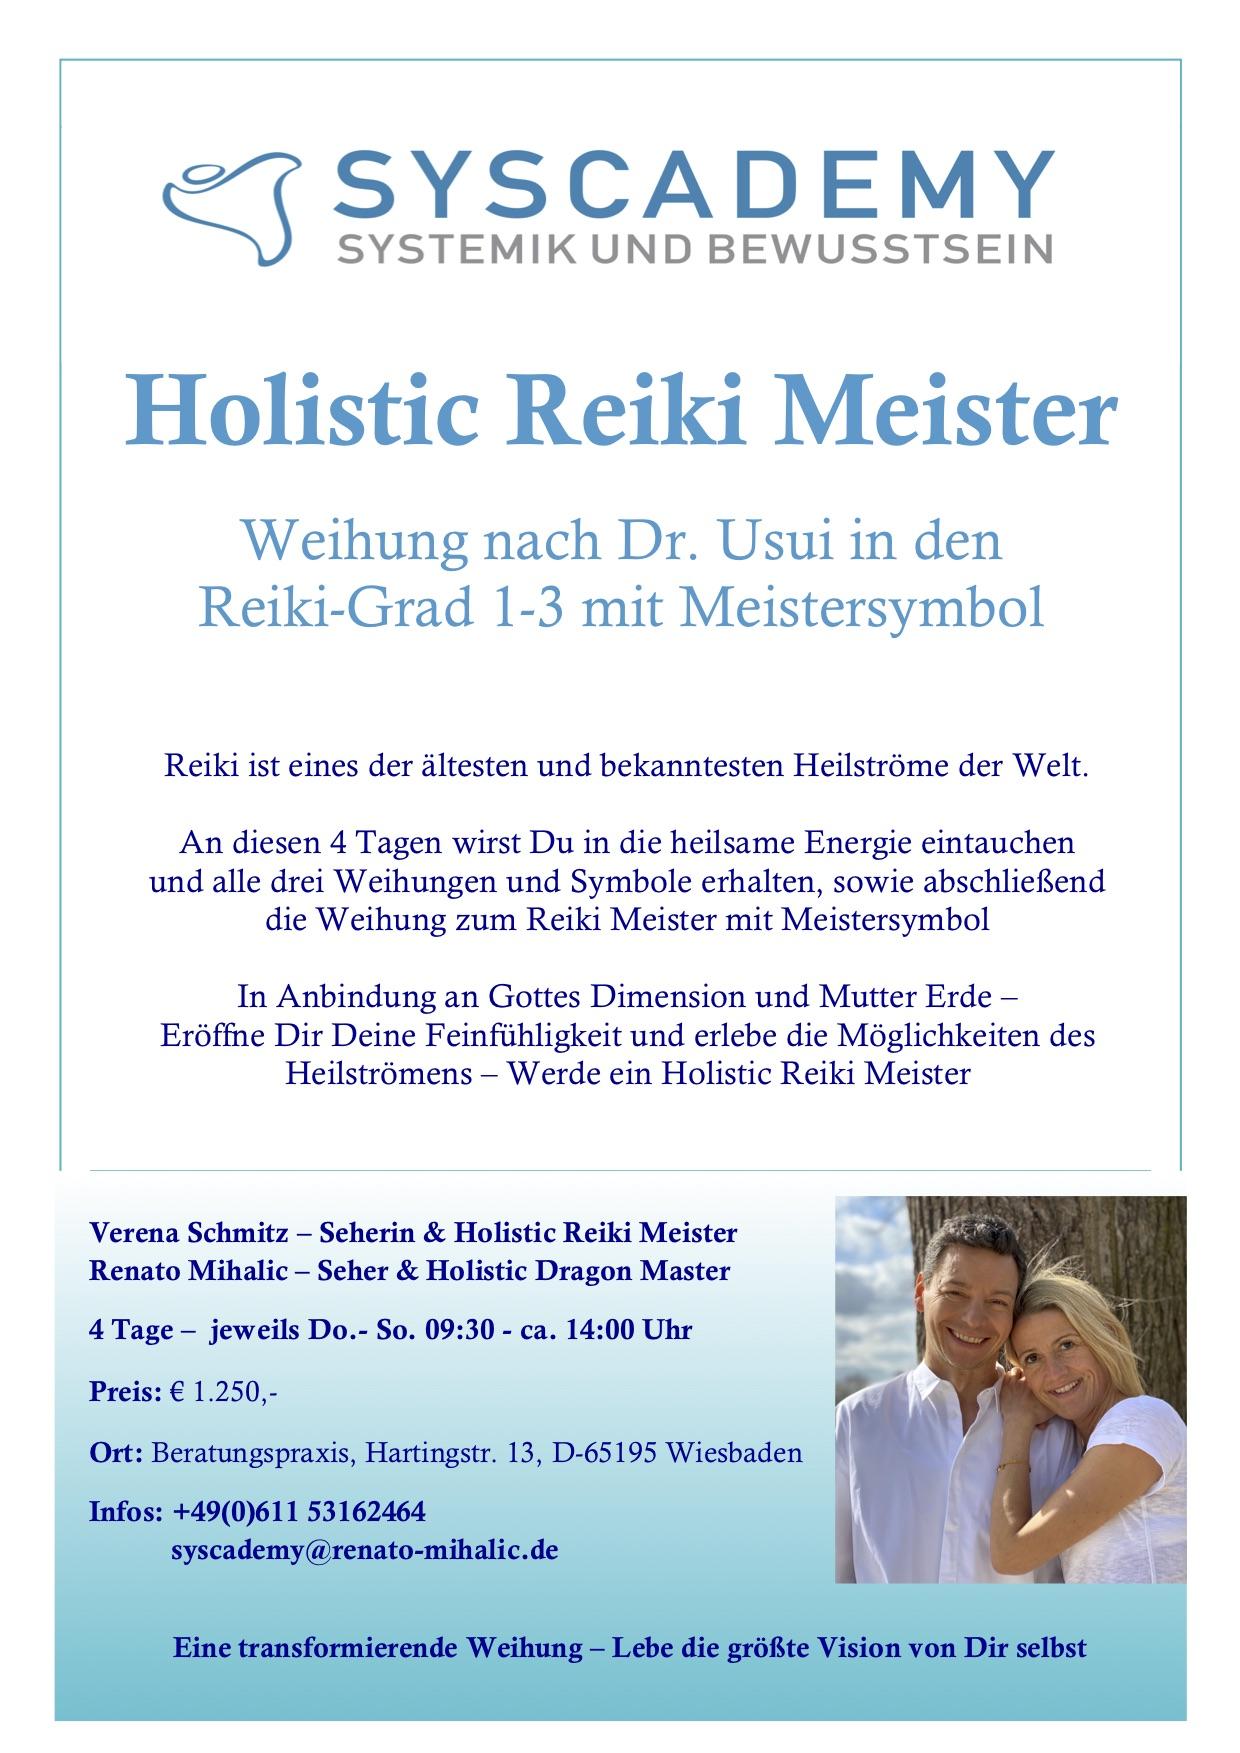 Flyer_Reiki Meister